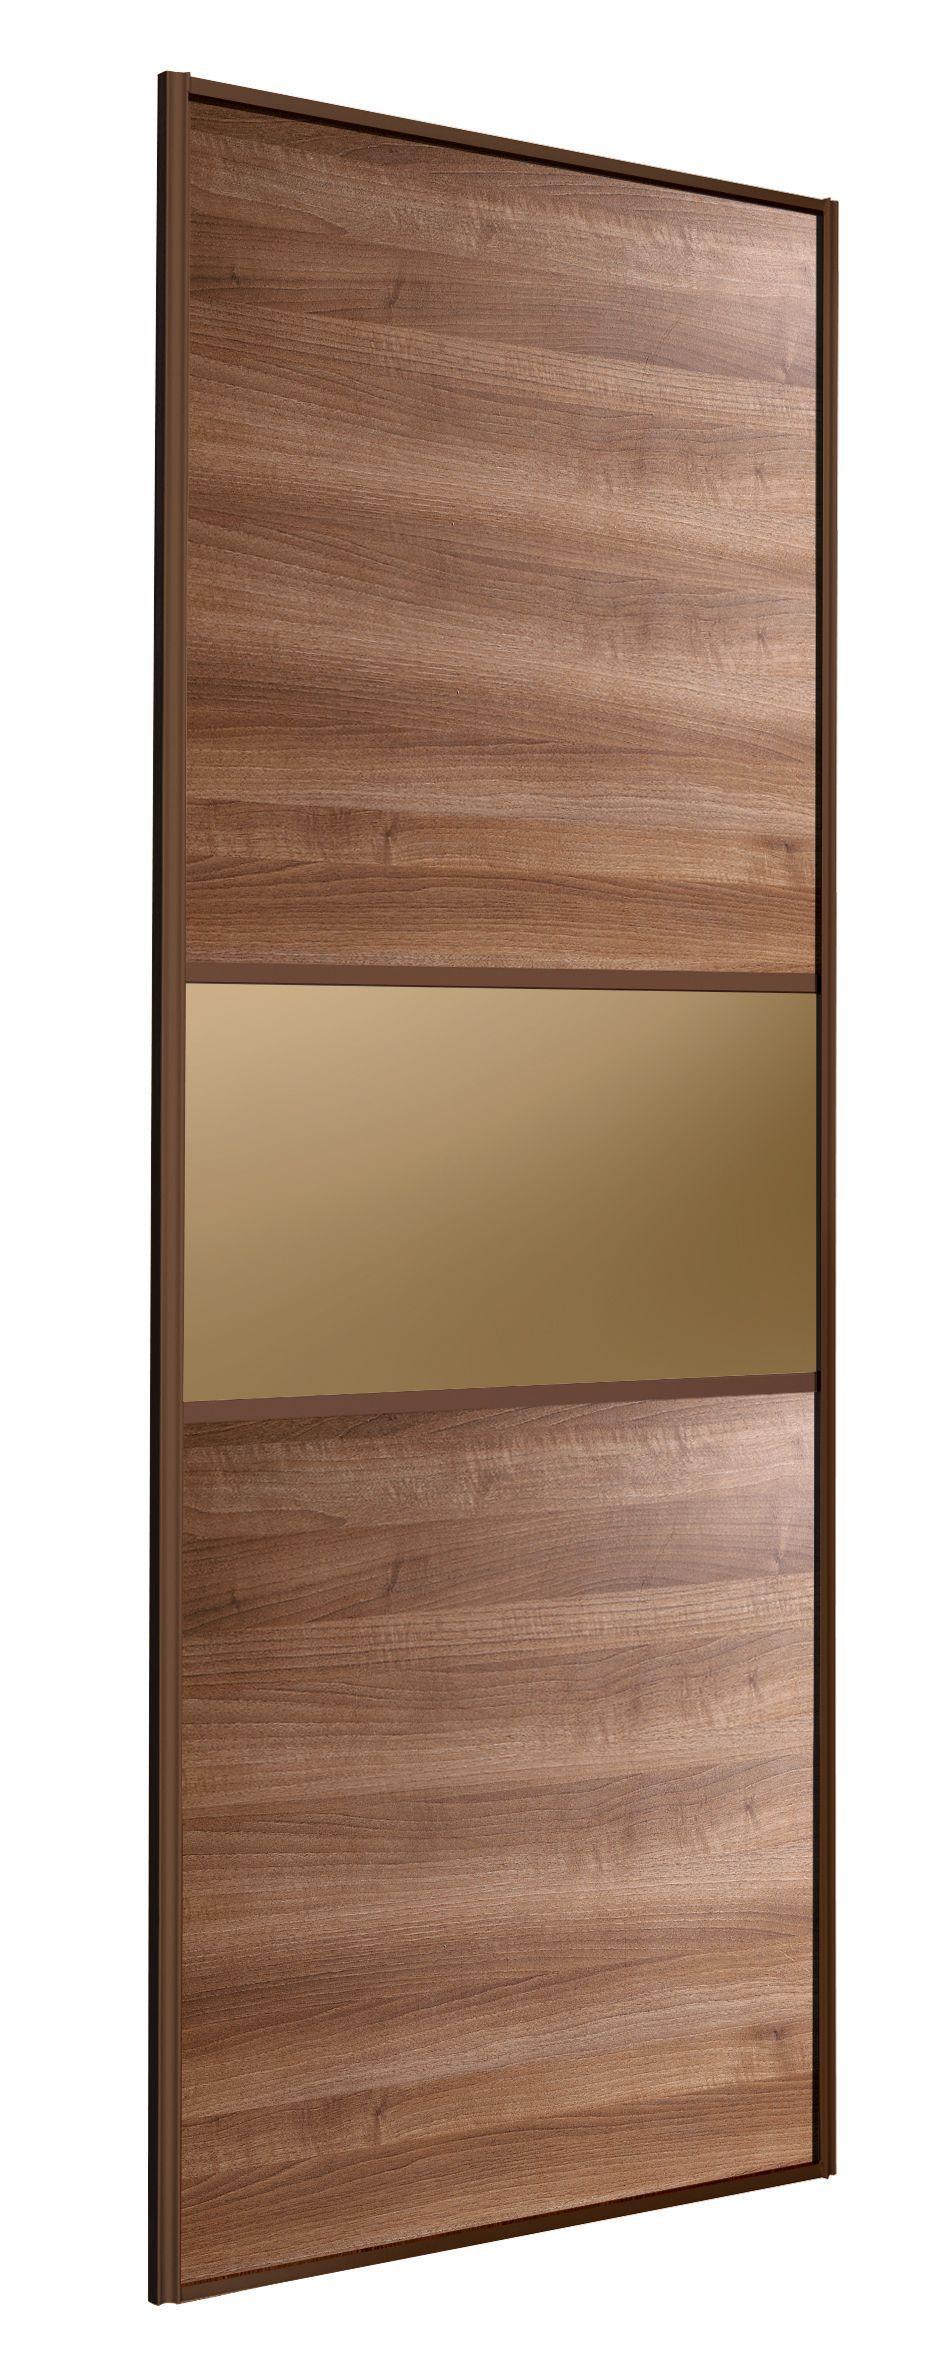 Shaker oak effect sliding wardrobe door h 2220 mm w 914 for B q bedrooms sliding wardrobe doors